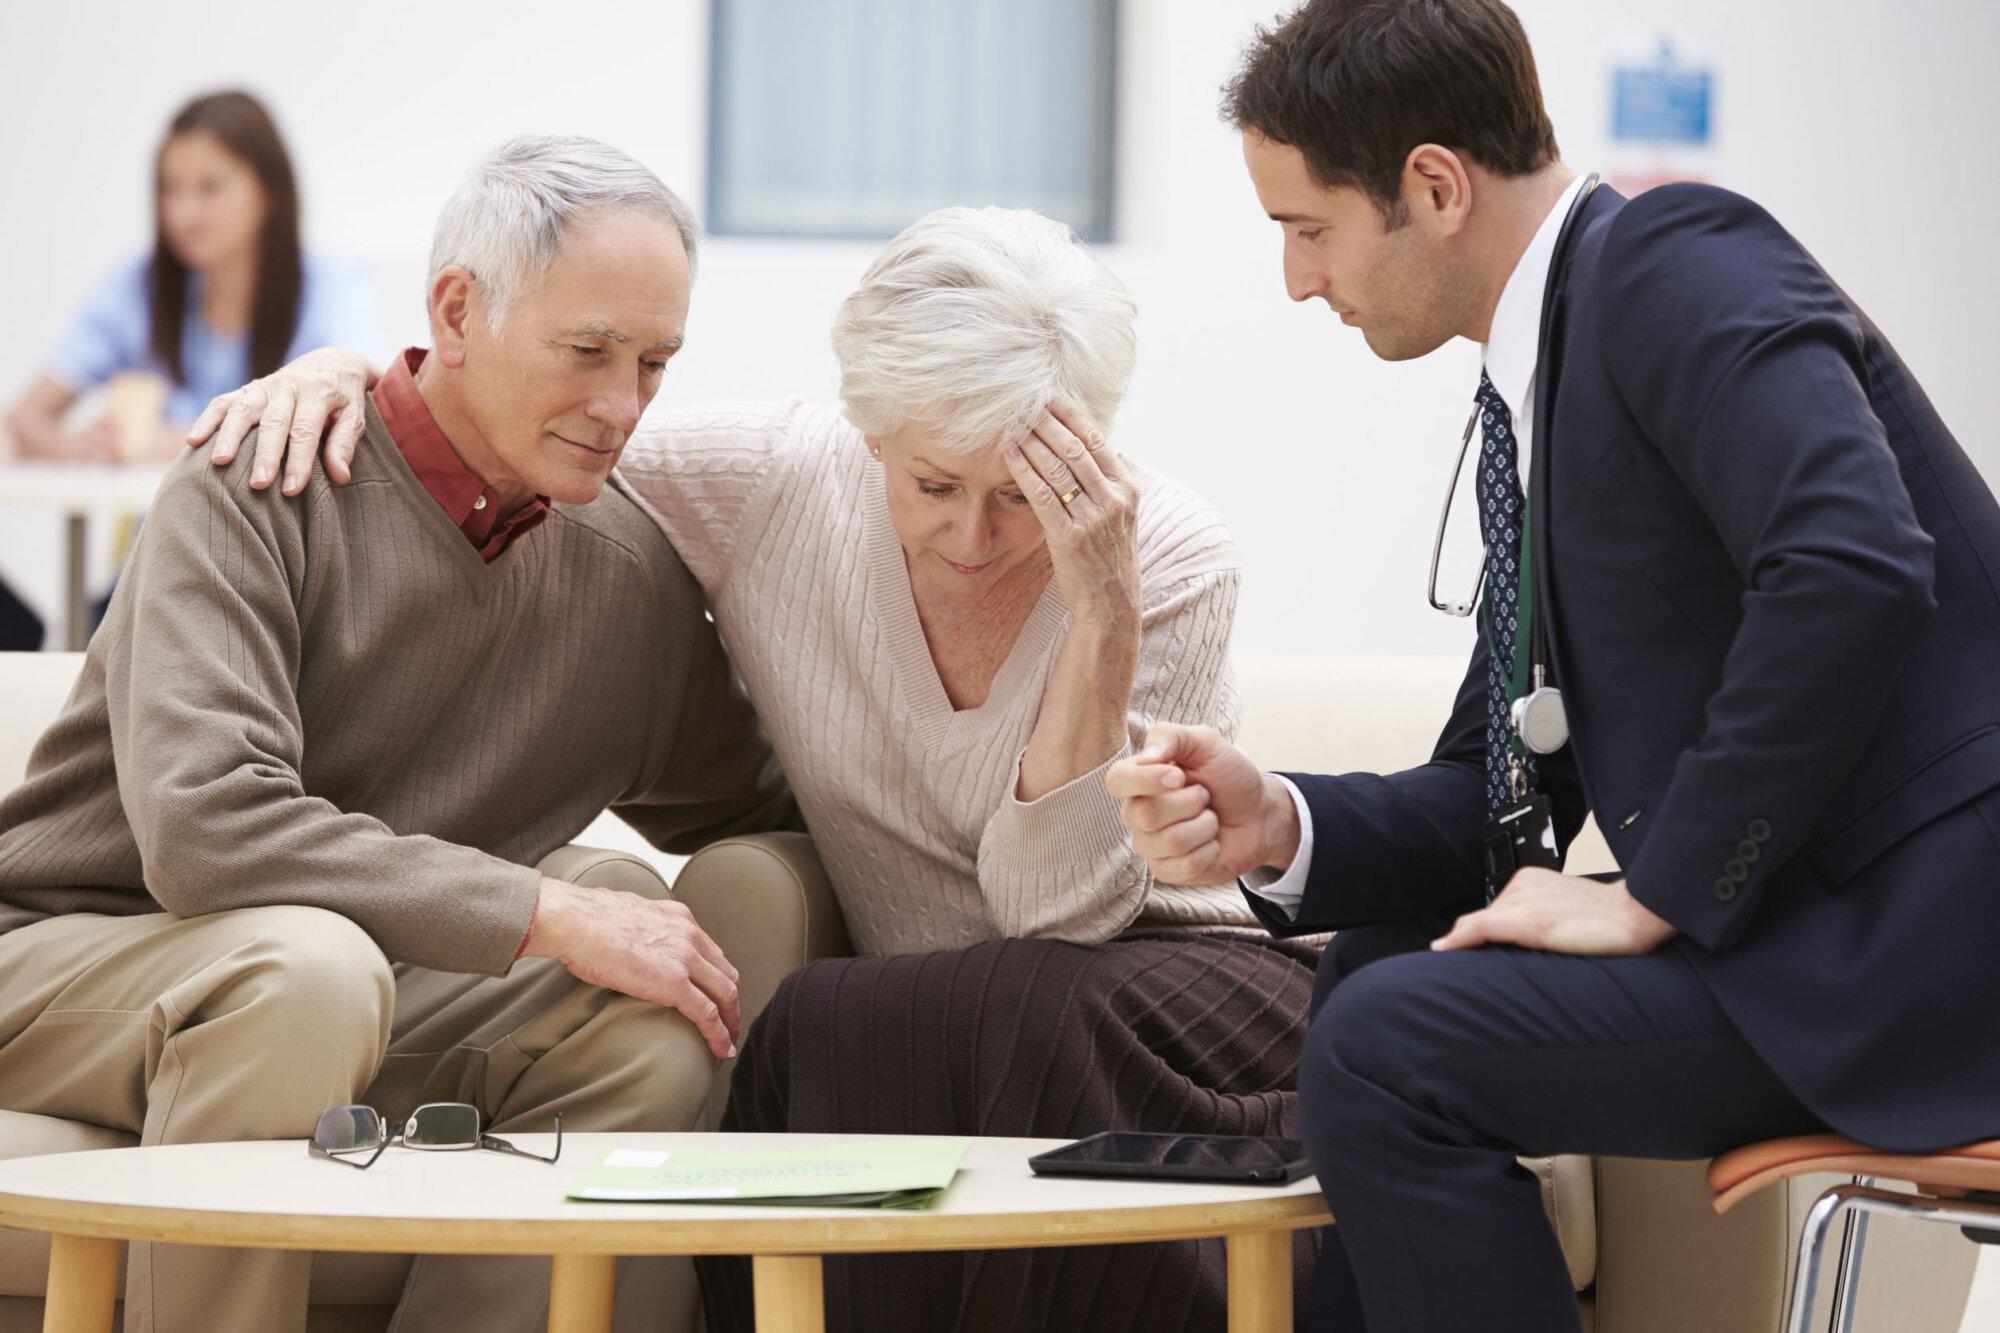 Restoring Doctors' Compassion